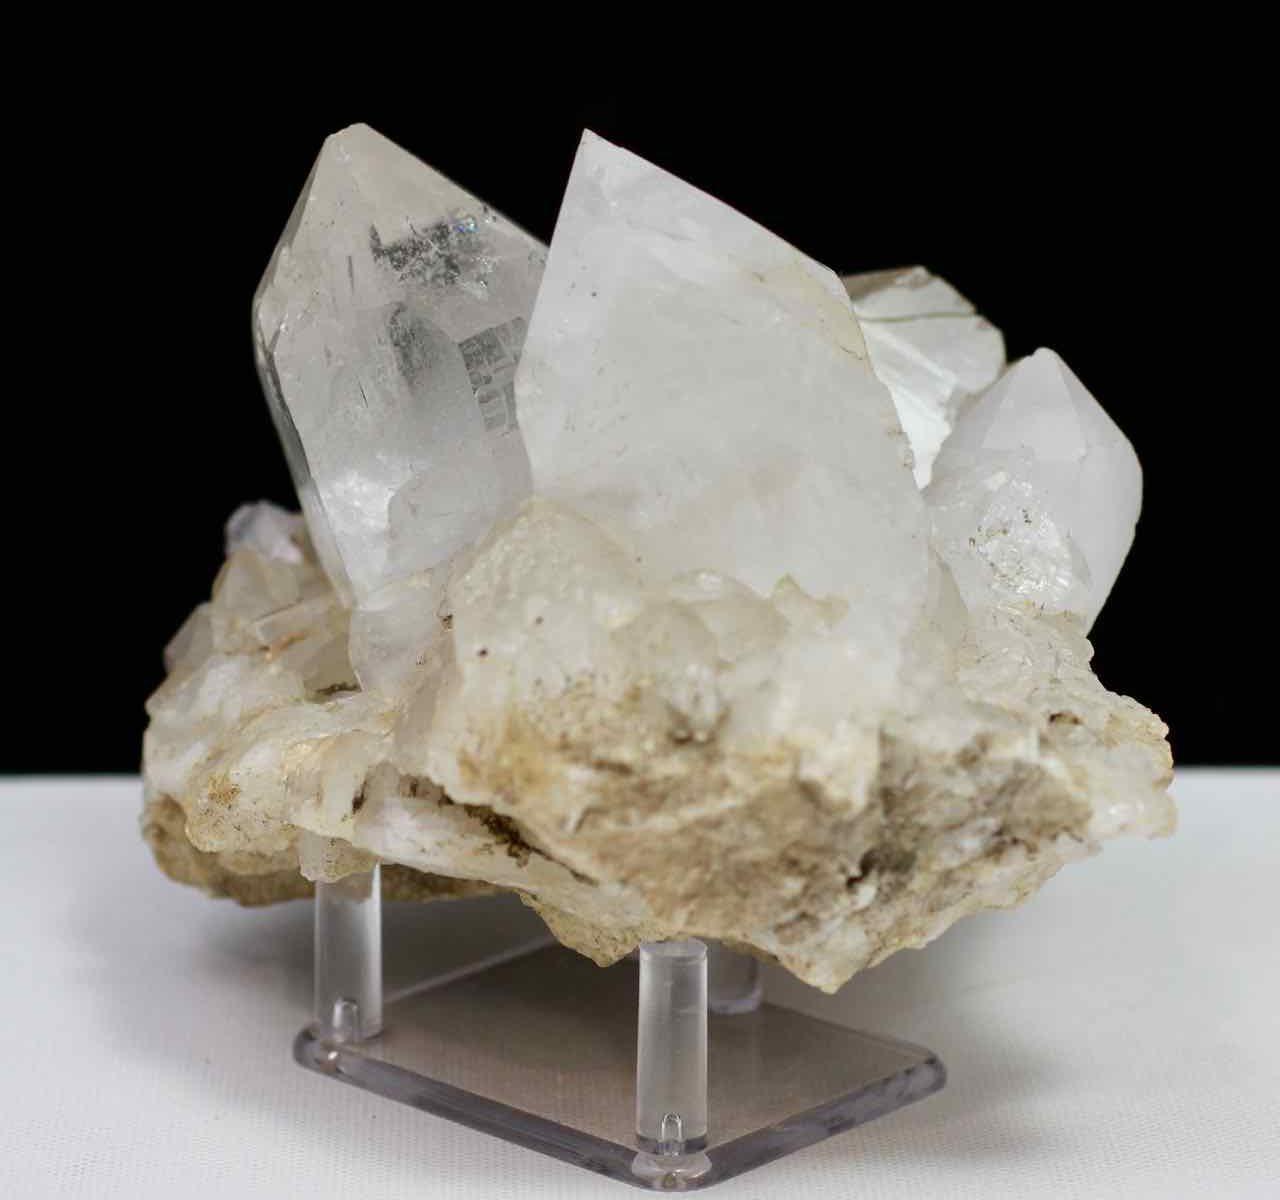 Clear Quartz Crystal, Himalayan Clear Quartz Crystal, Himalayan Mountains, Quartz deposits, Iron, Himalayan quartz, Reiki Charged, pure vibrating, loving energy, healing intentions, Metaphysical healing, crown chakra stone, Master Healer, amplify energies.